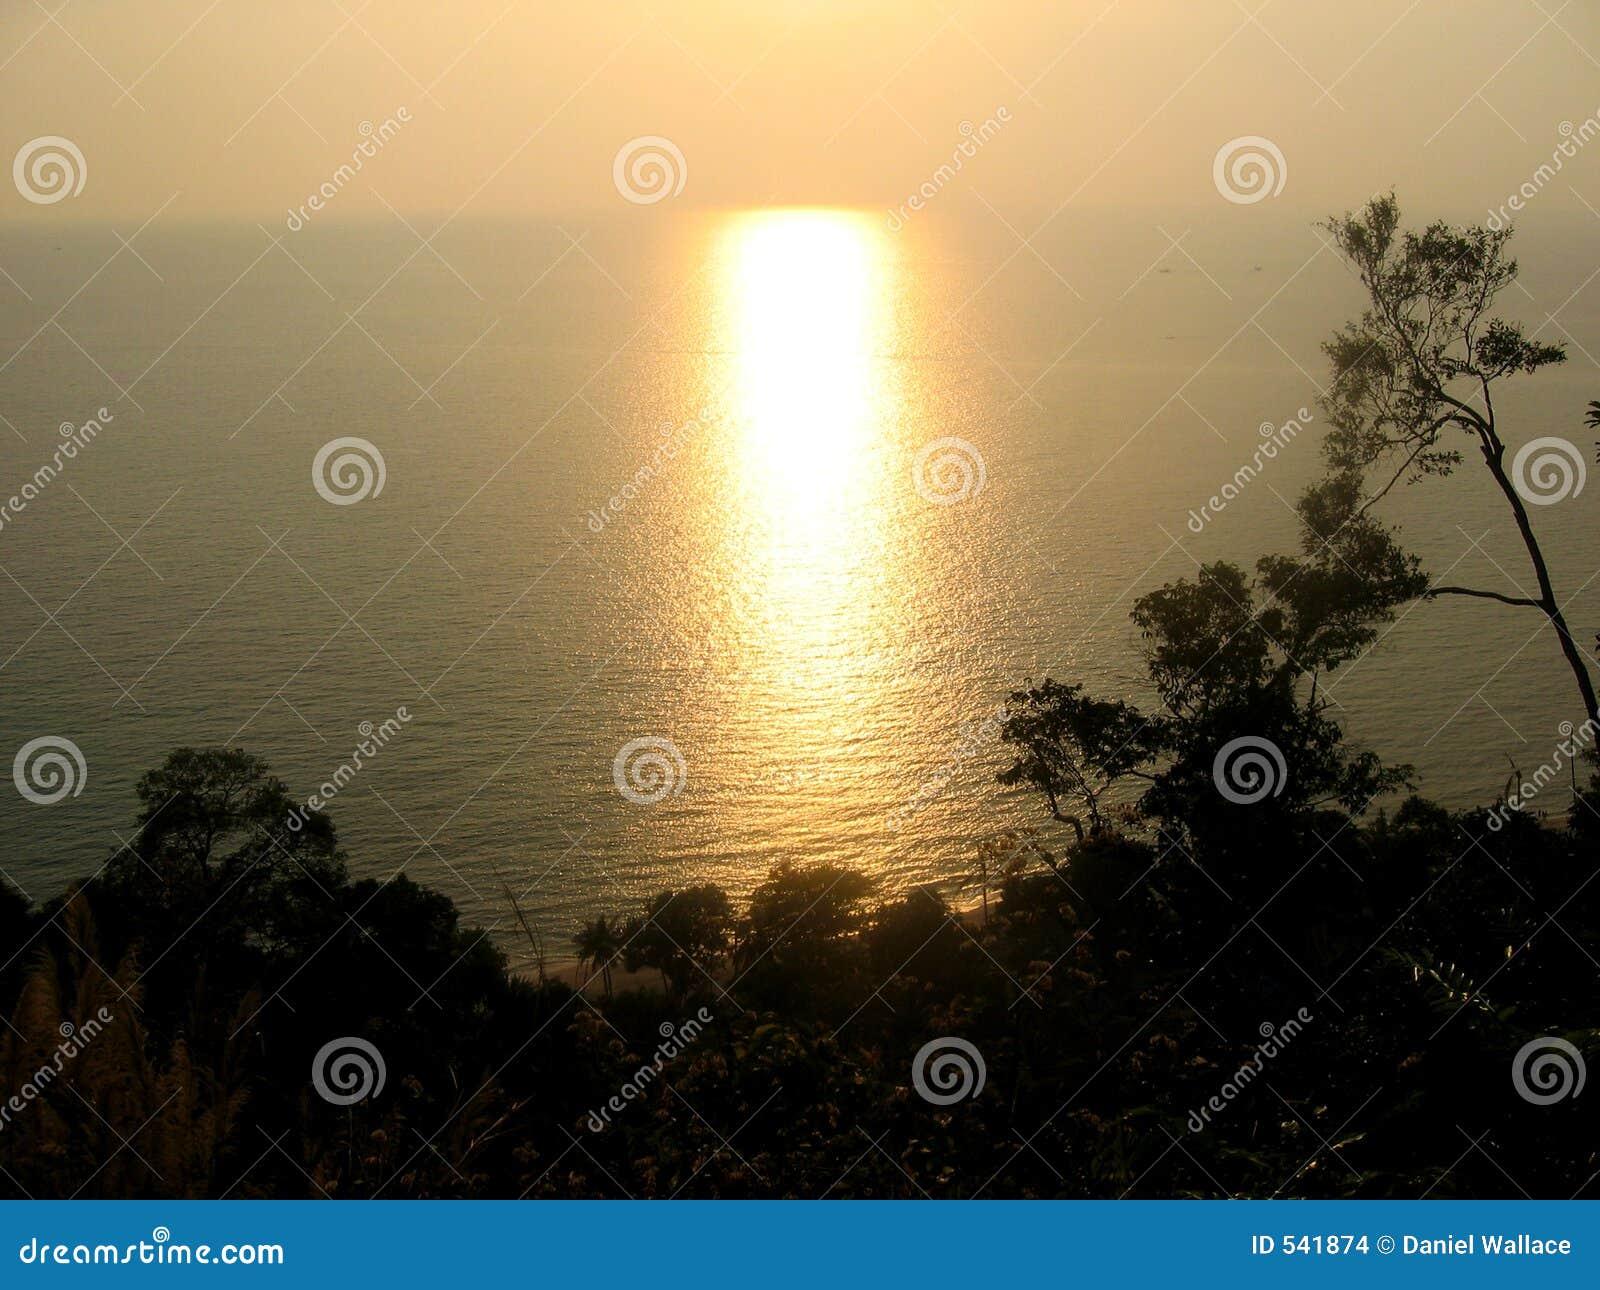 Download 日落注意 库存照片. 图片 包括有 温暖, 日落, 农村, 旅游业, 热带, 平静, 结构树, 日出, 旅行 - 541874